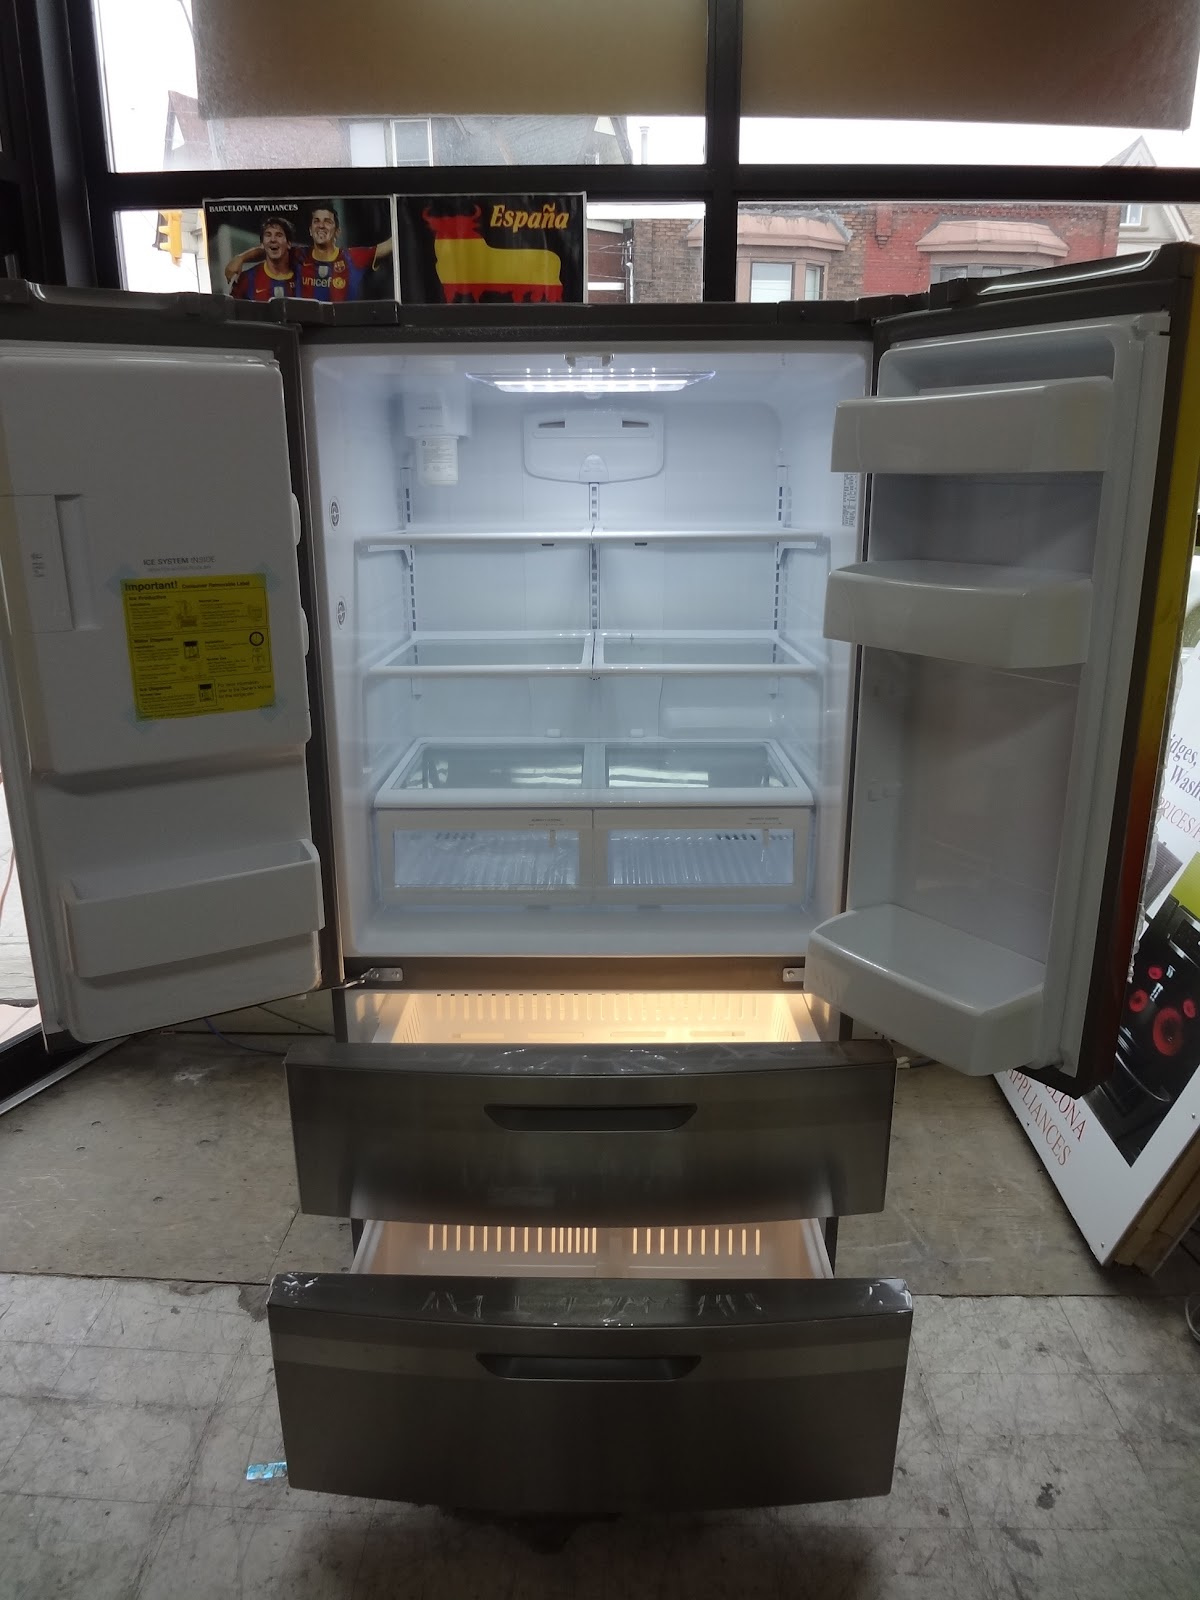 Refrigerators barcelona home appliances brand new lg stainless steel french door fridge model lfx25976st 247 cu ft 36 wide only 150000 rubansaba